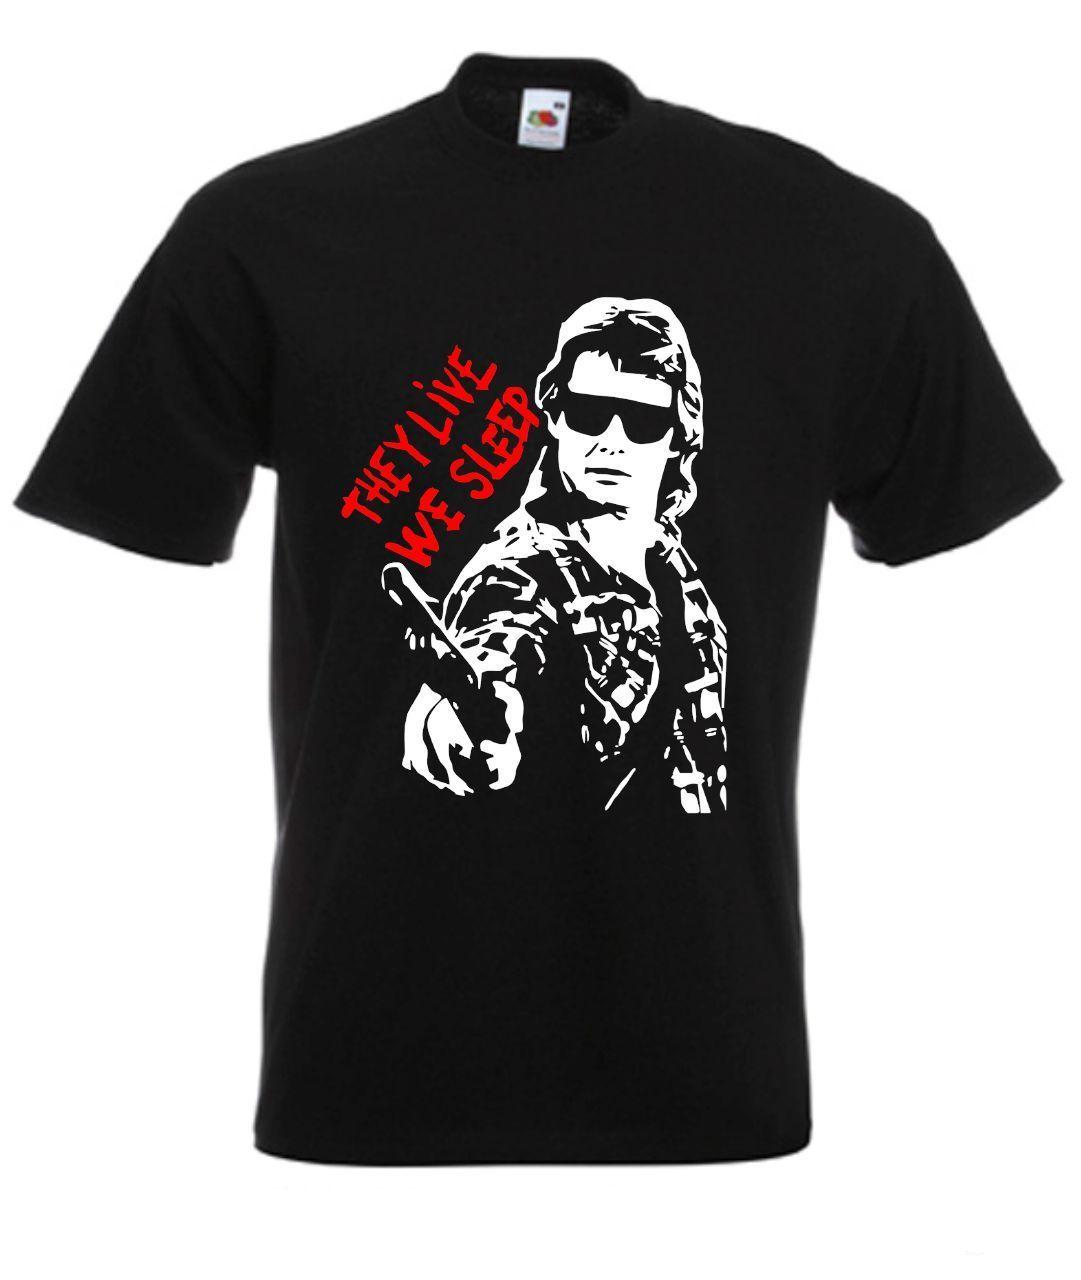 Camiseta de la película de John Carpenter/Sudadera con capucha Cool Casual pride camiseta hombres Unisex moda camiseta gratis